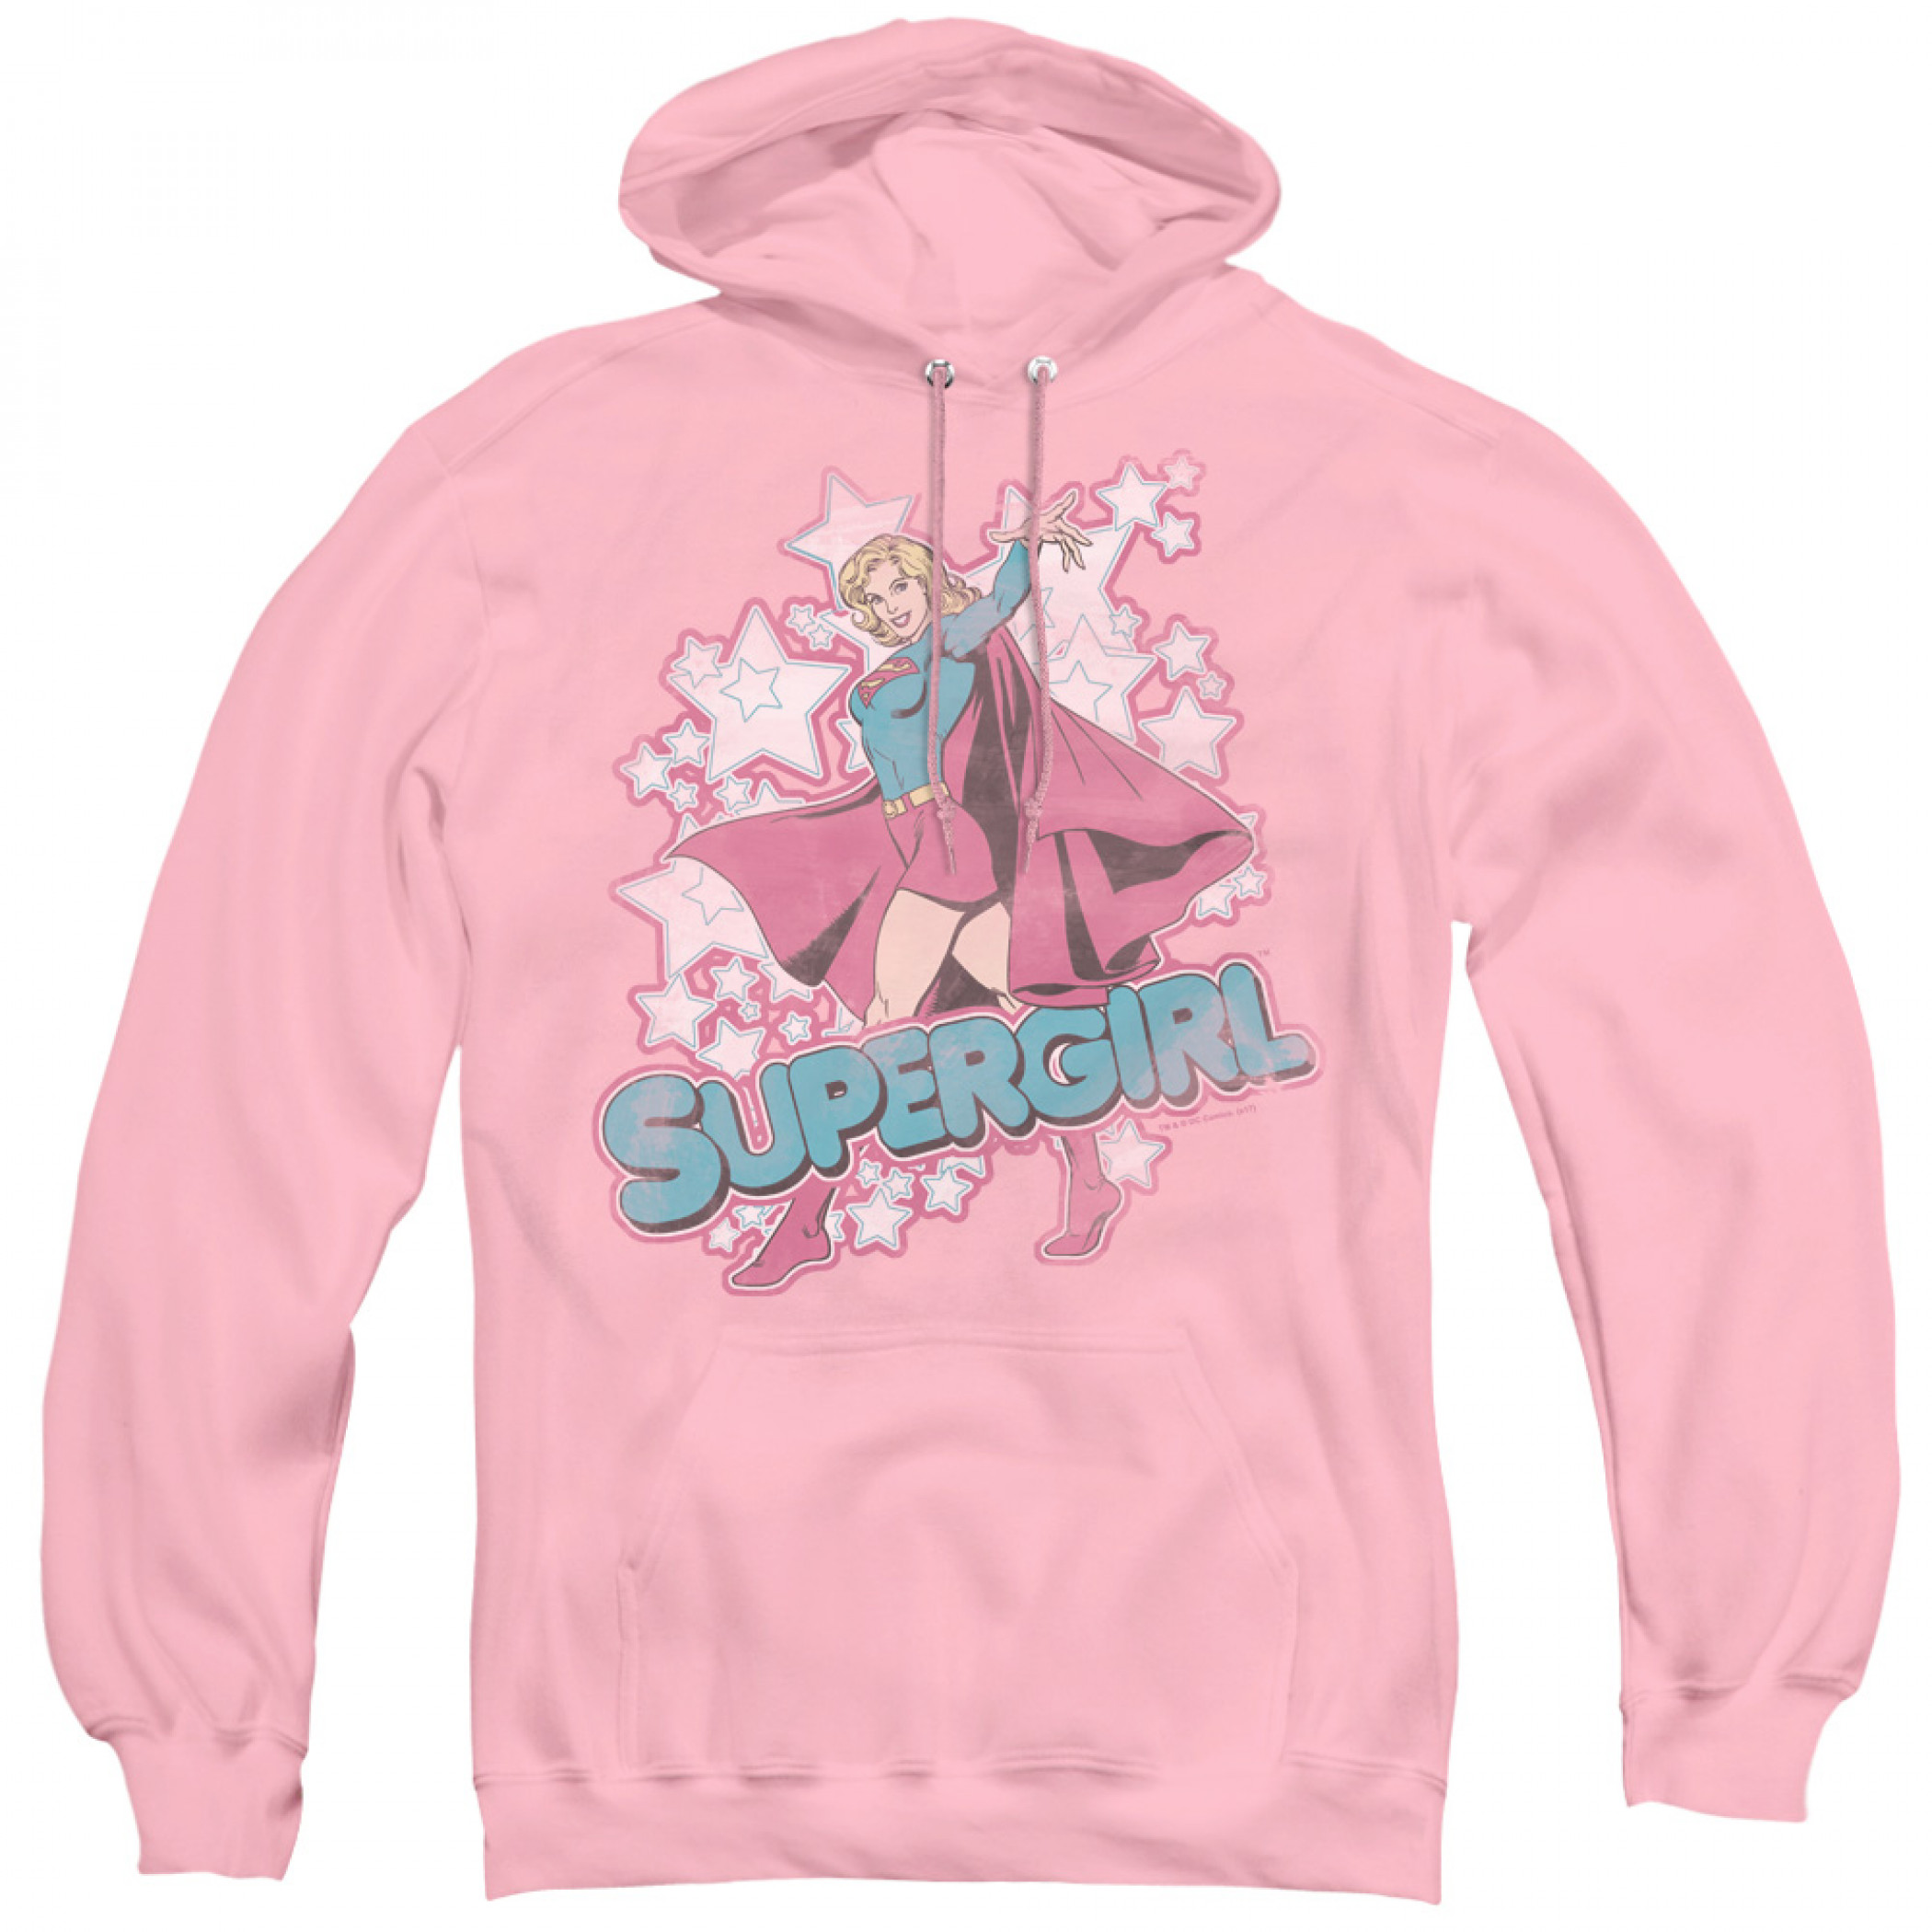 Supergirl Pose Women's Pink Hoodie